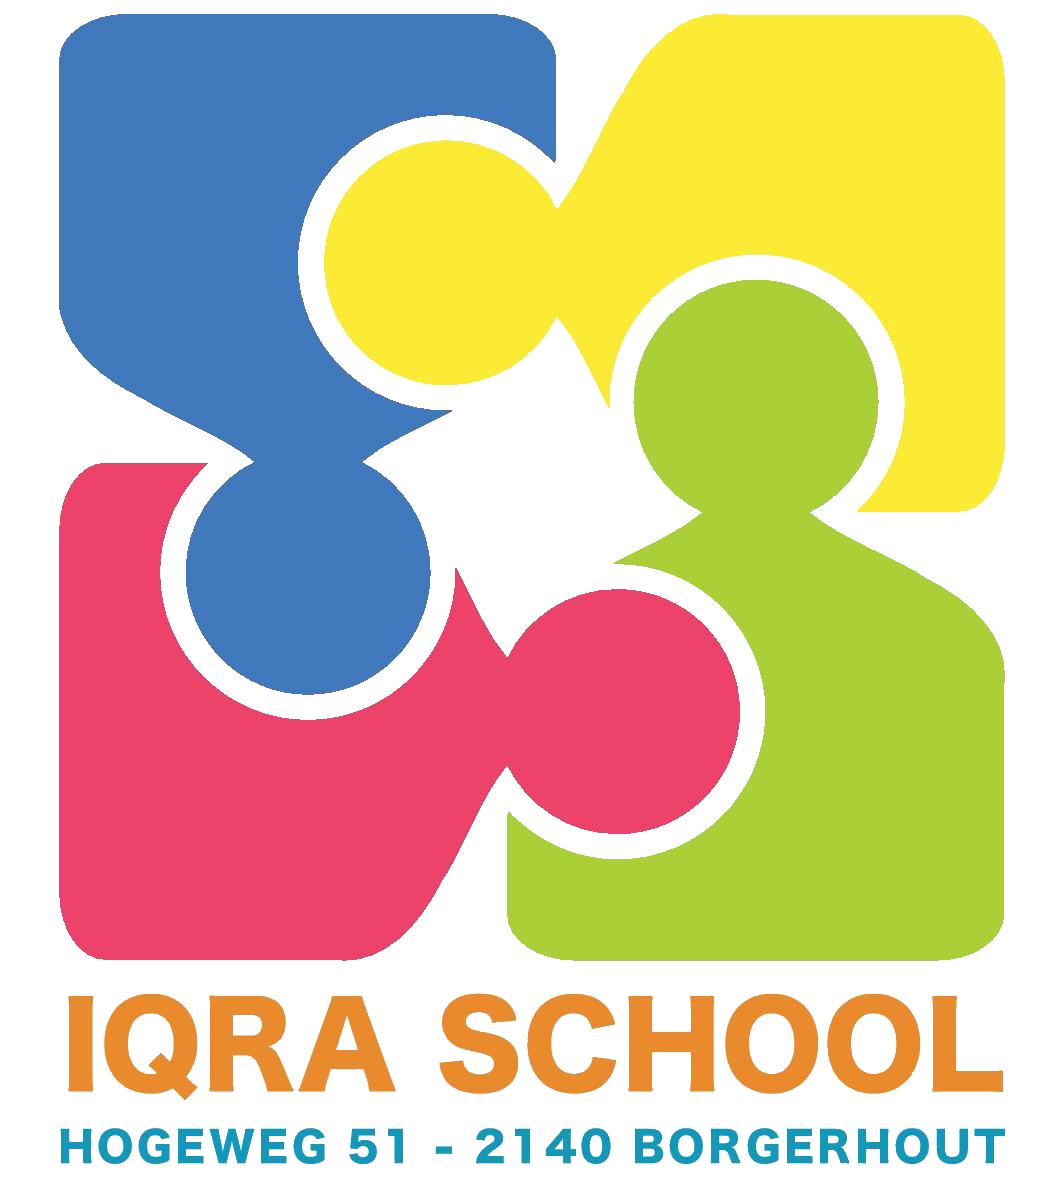 IQRA SCHOOL